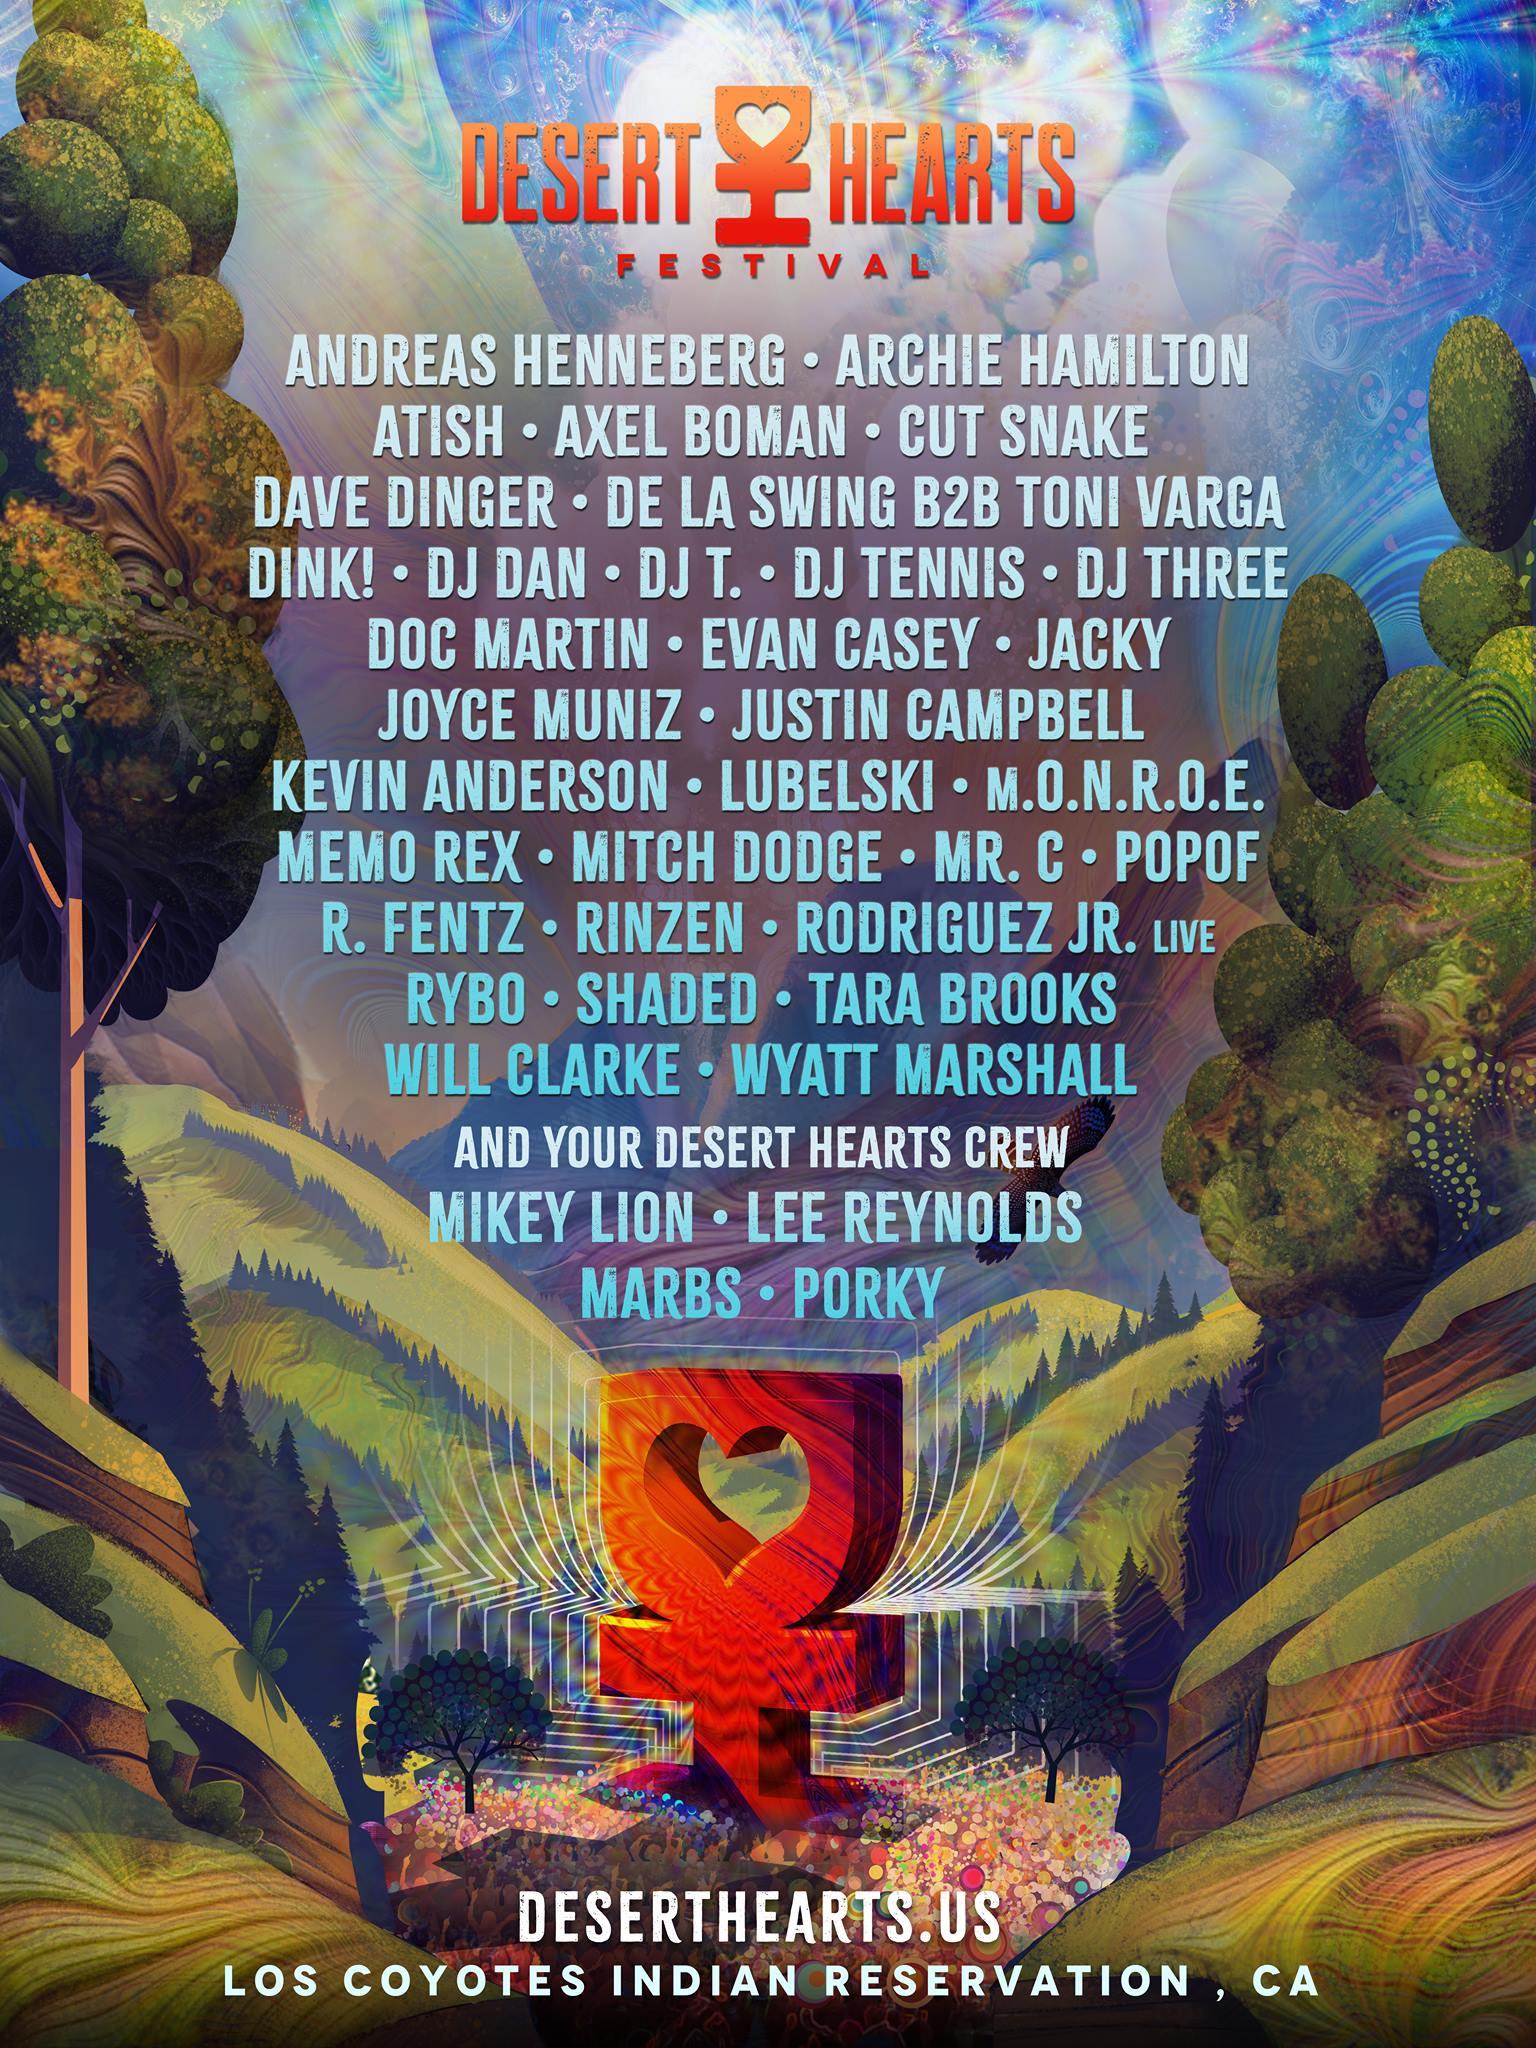 Desert Hearts Festival 2019 Lineup